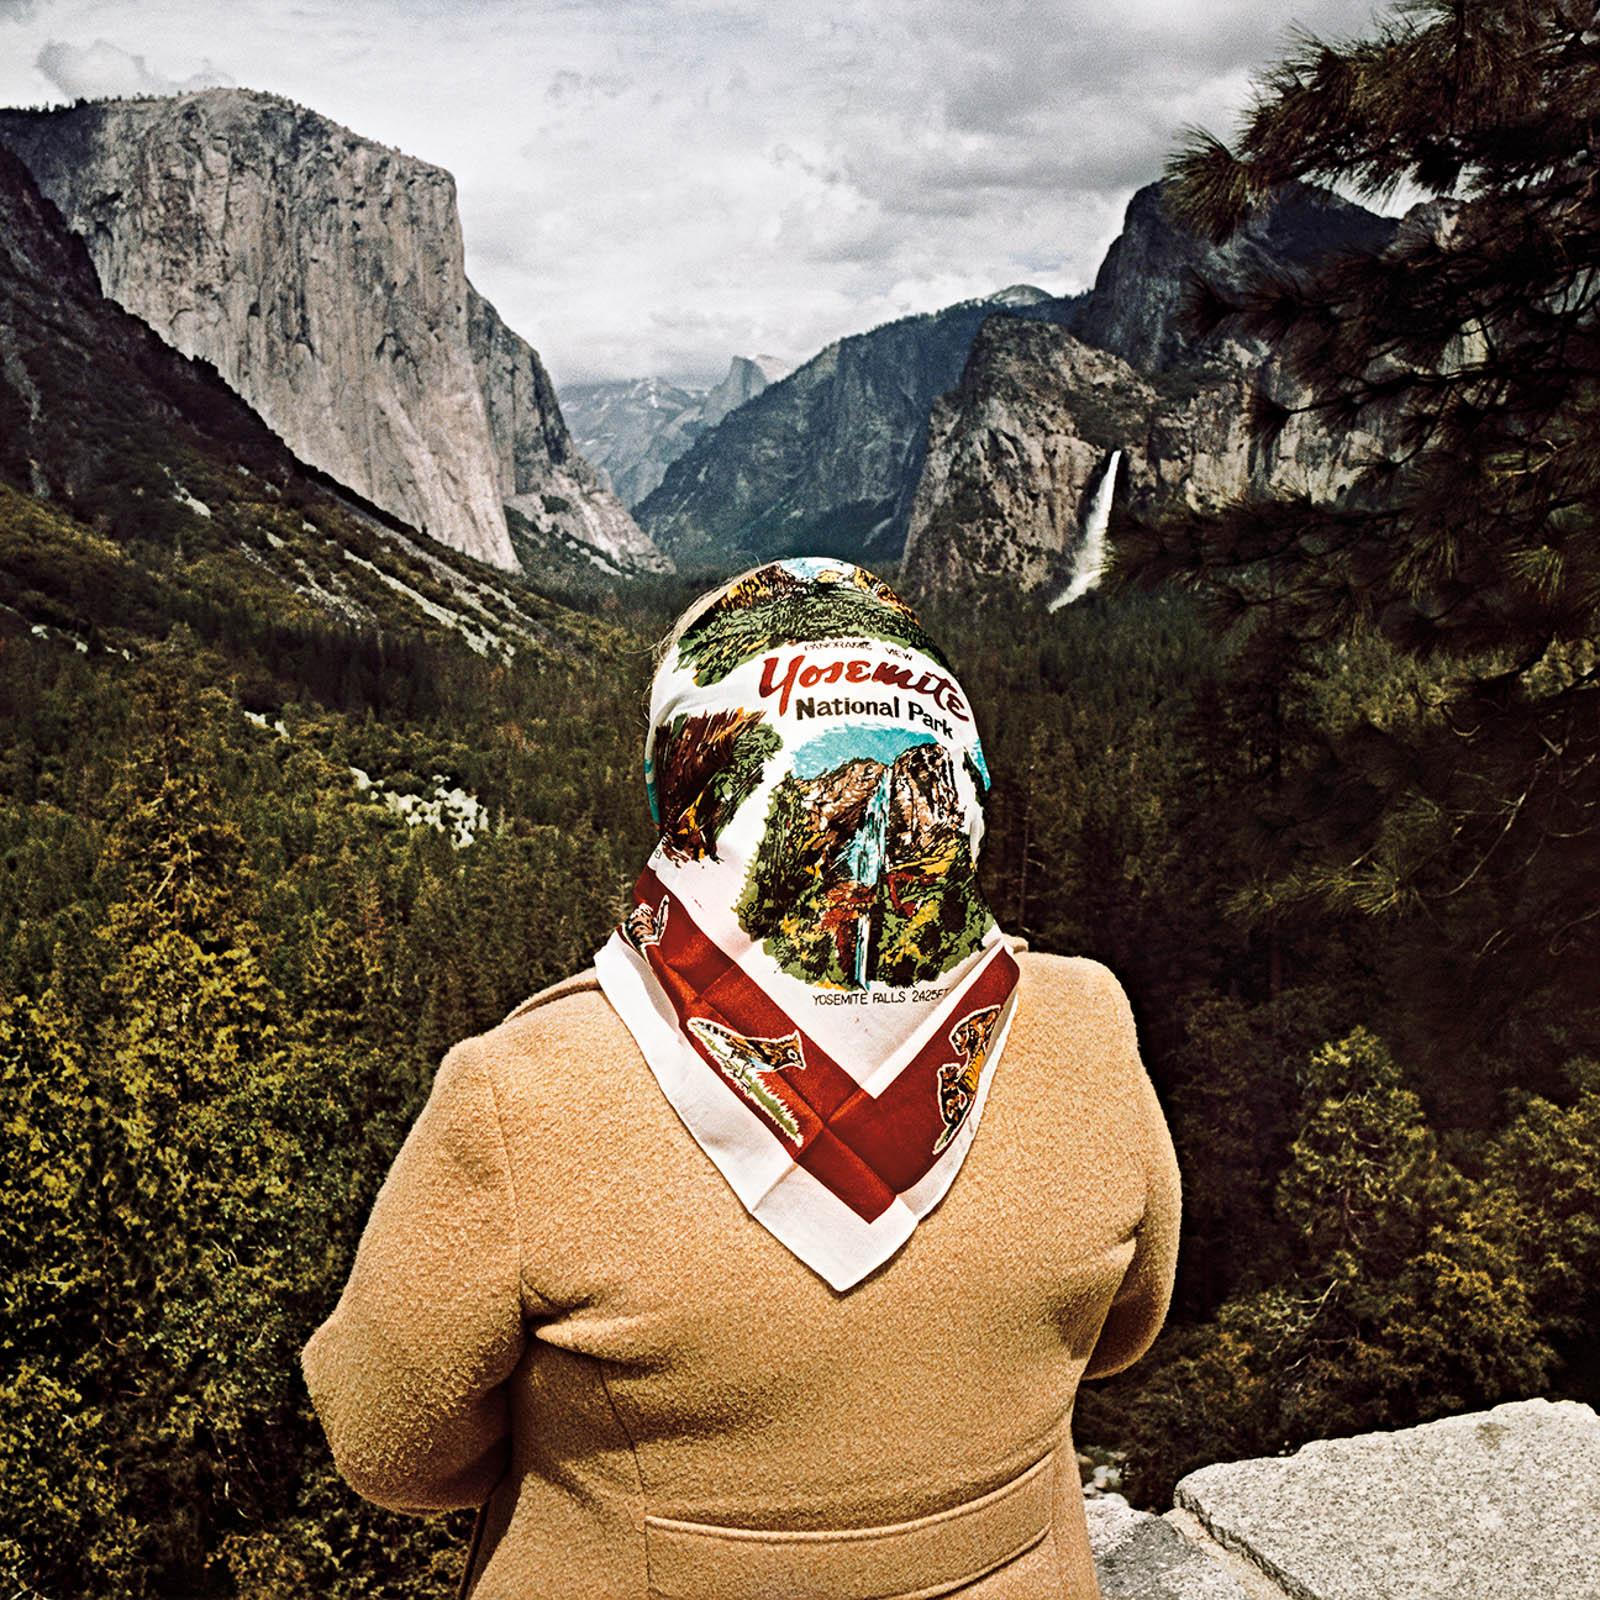 Woman at Inspiration Point, Yosemite National Park, California 1980